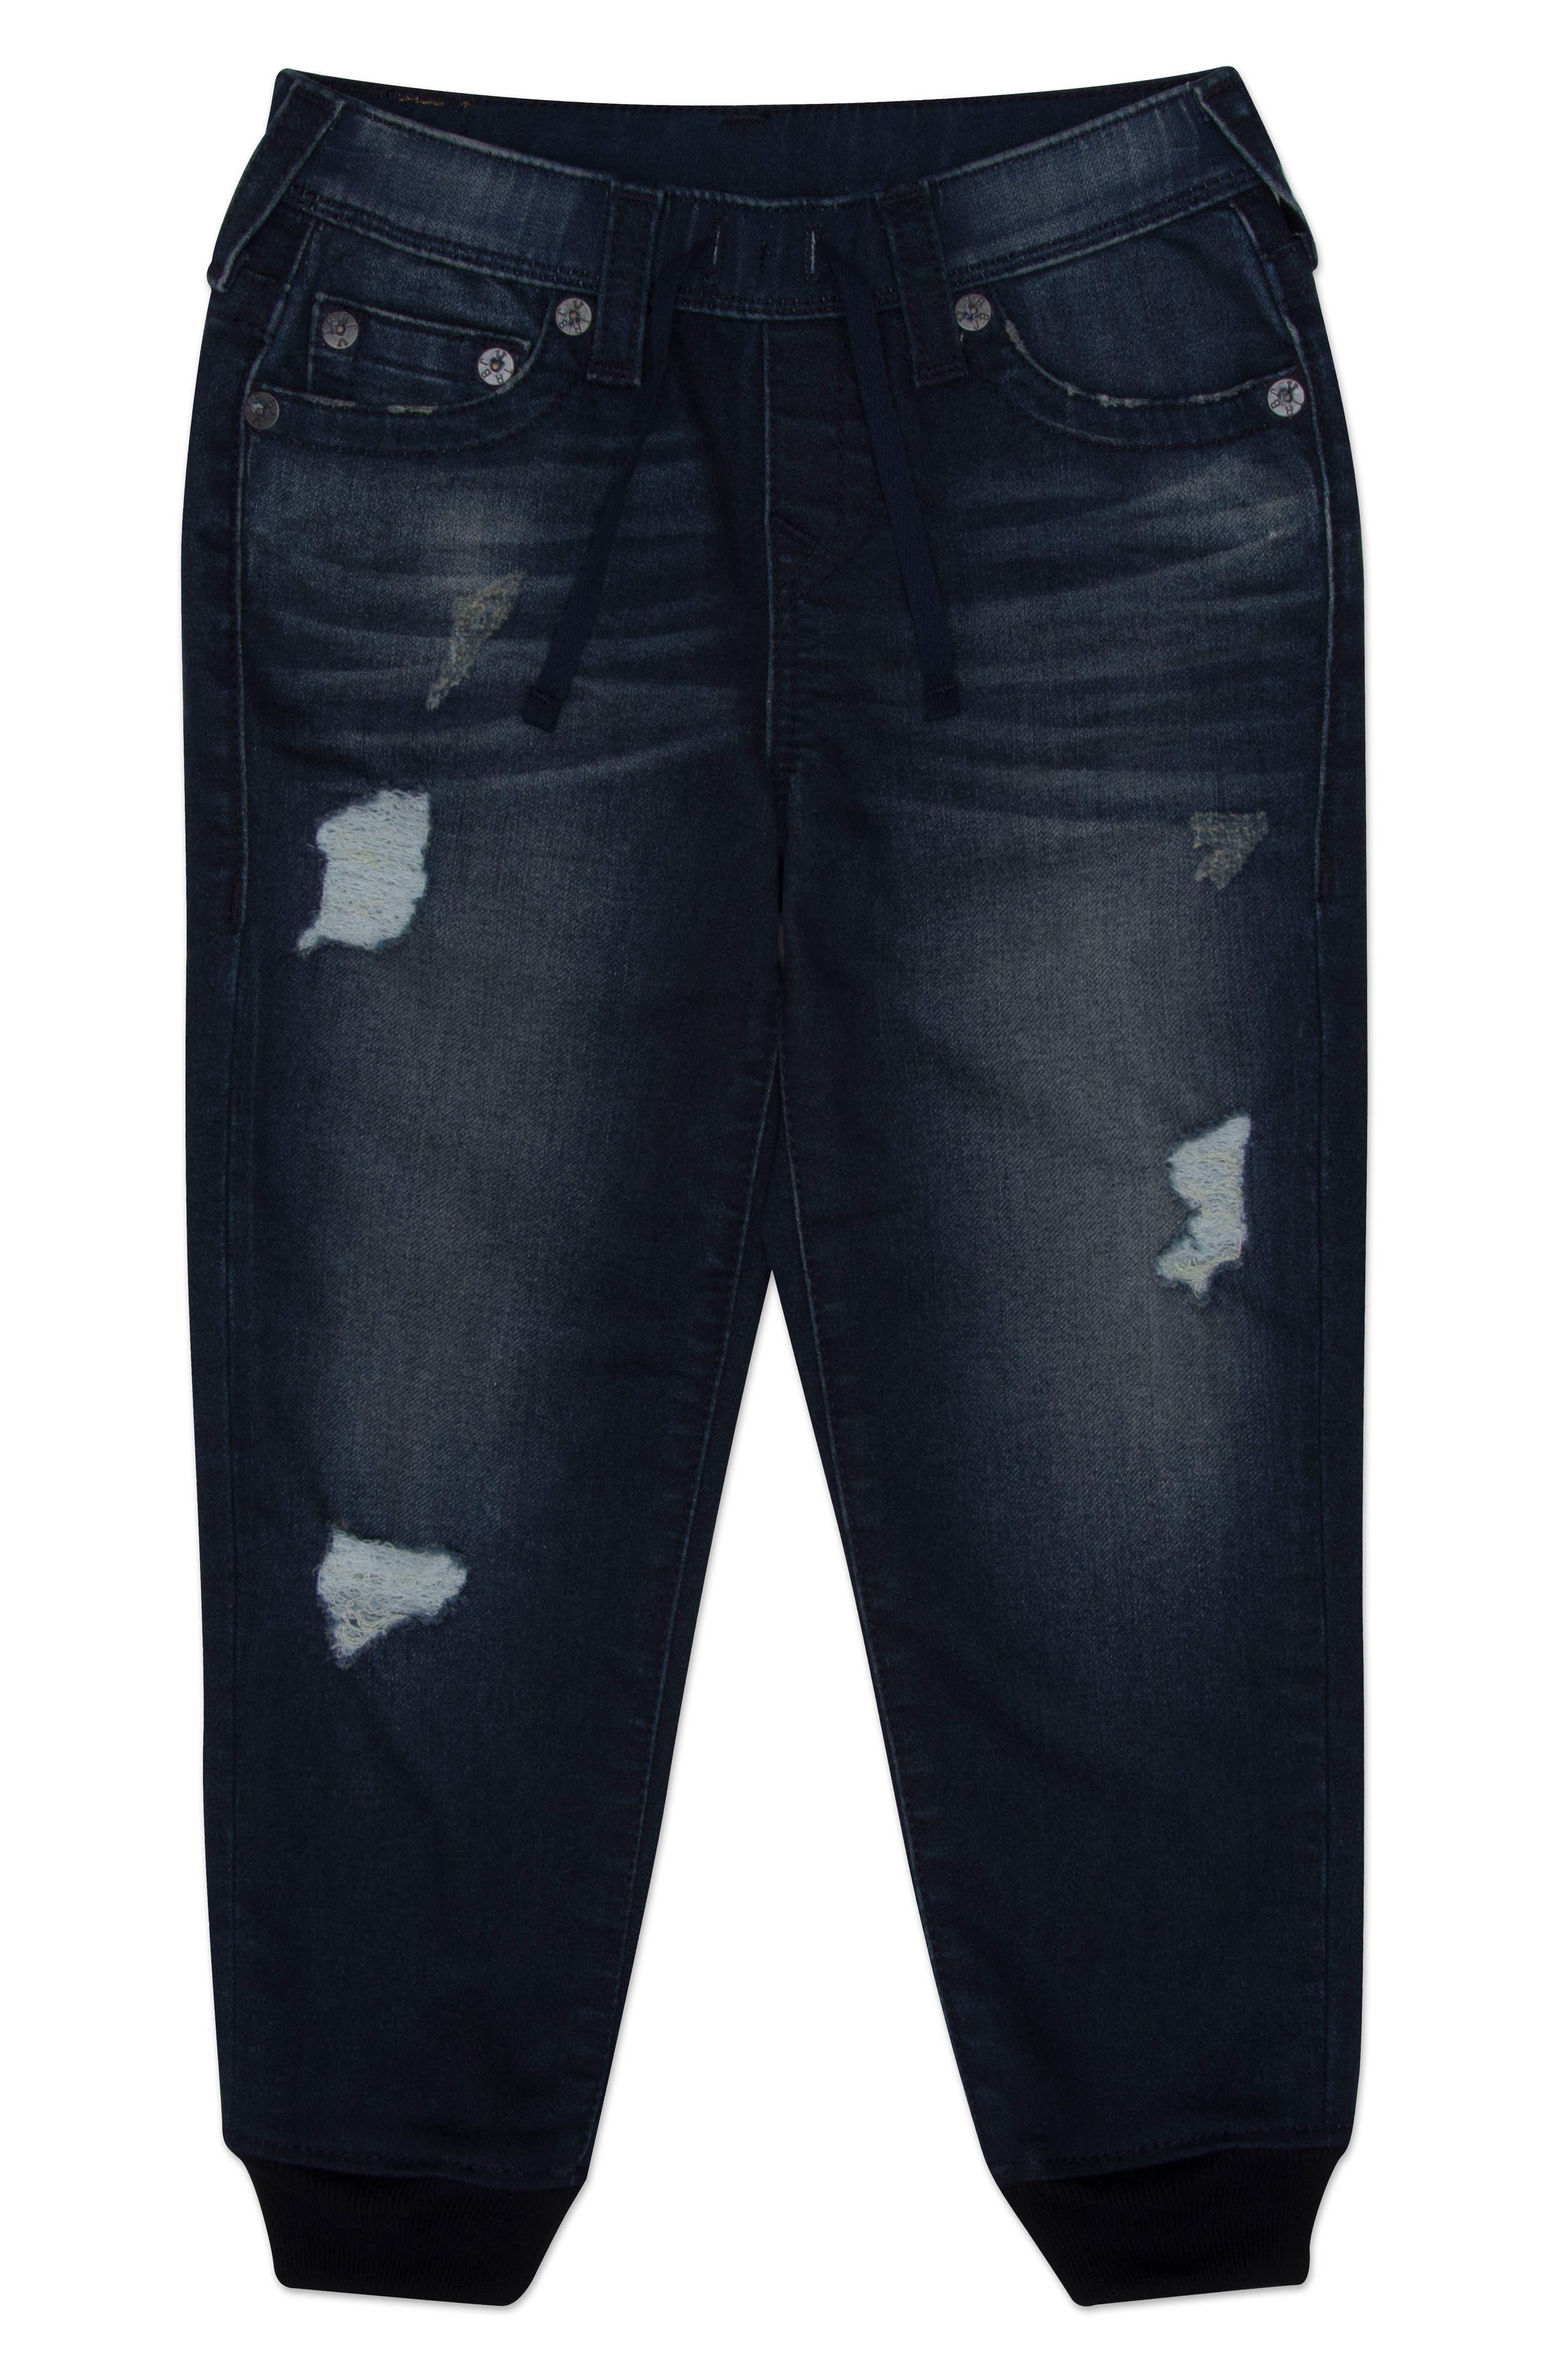 True Religion Brand Jeans Indigo Sweatpants (Toddler Boys & Little Boys)